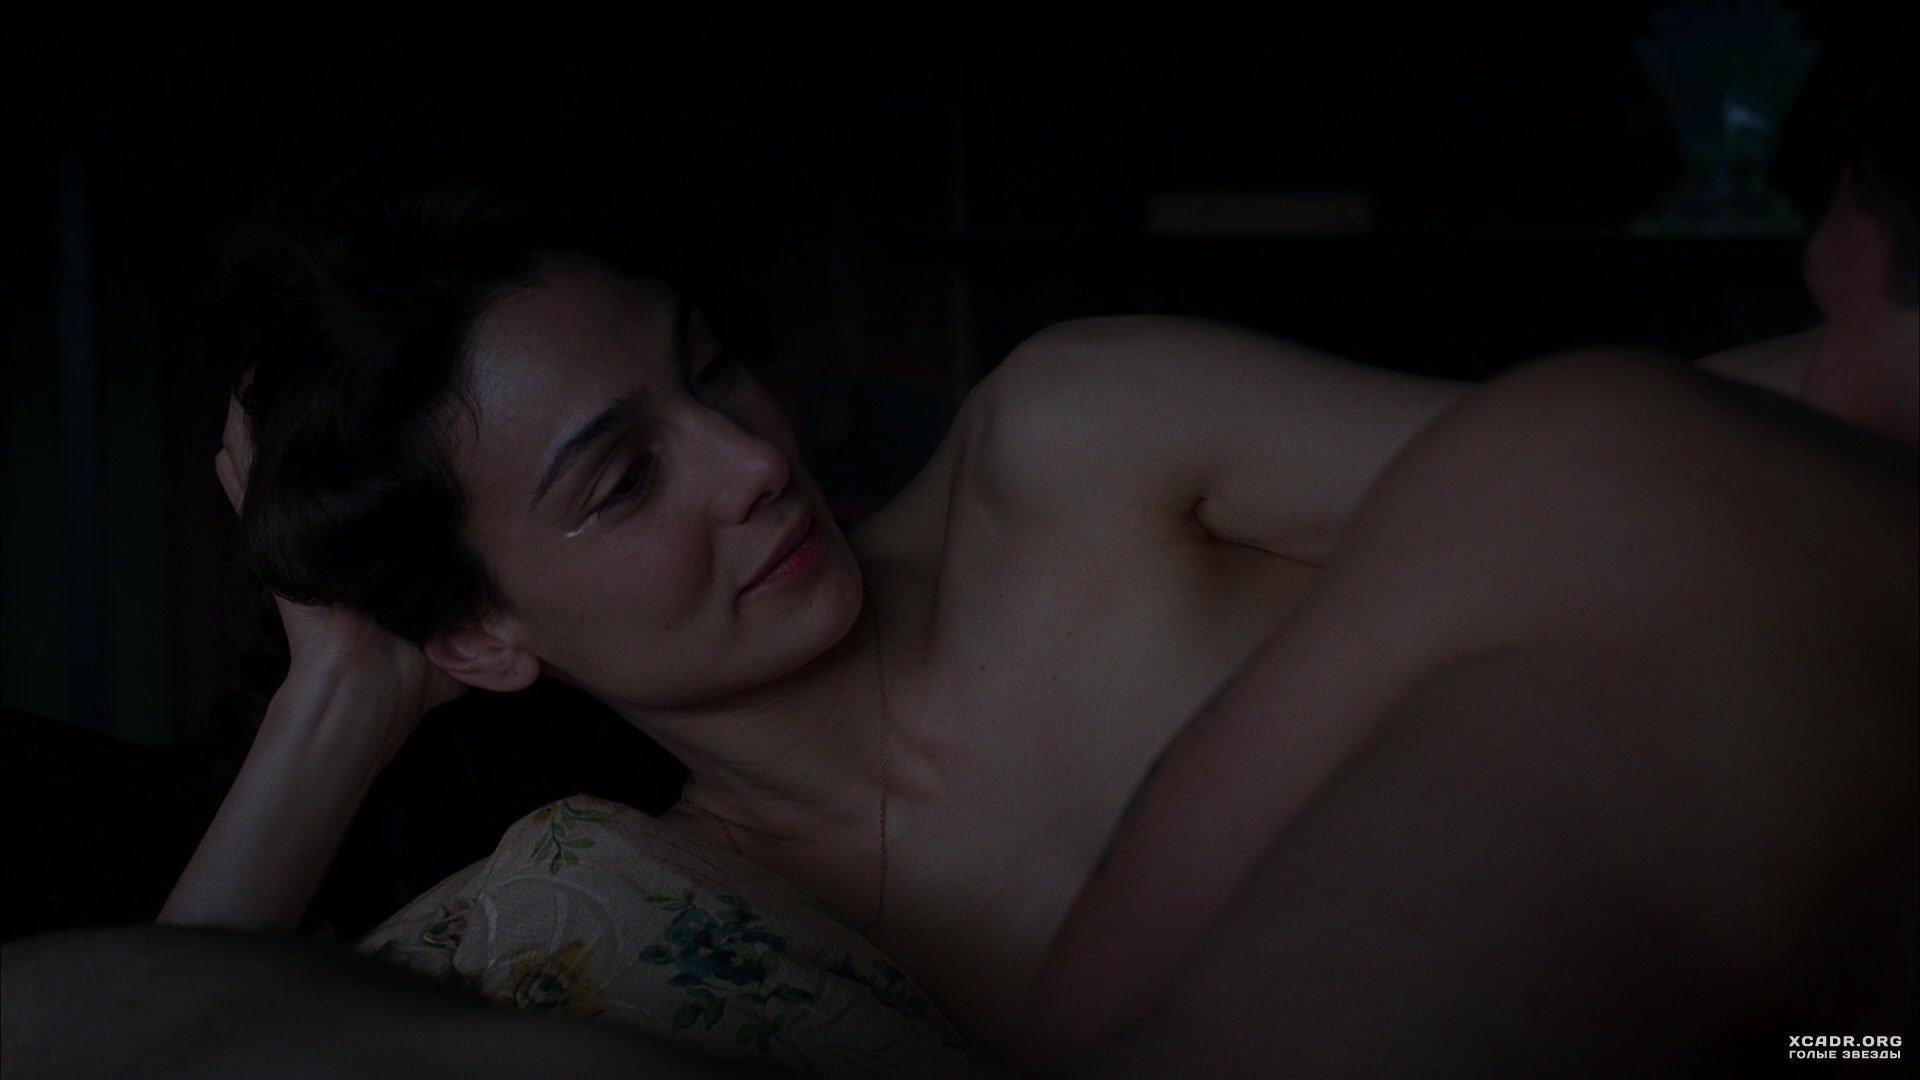 annie-parisse-sex-tape-free-porno-sex-pictures-for-hage-monastry-big-cock